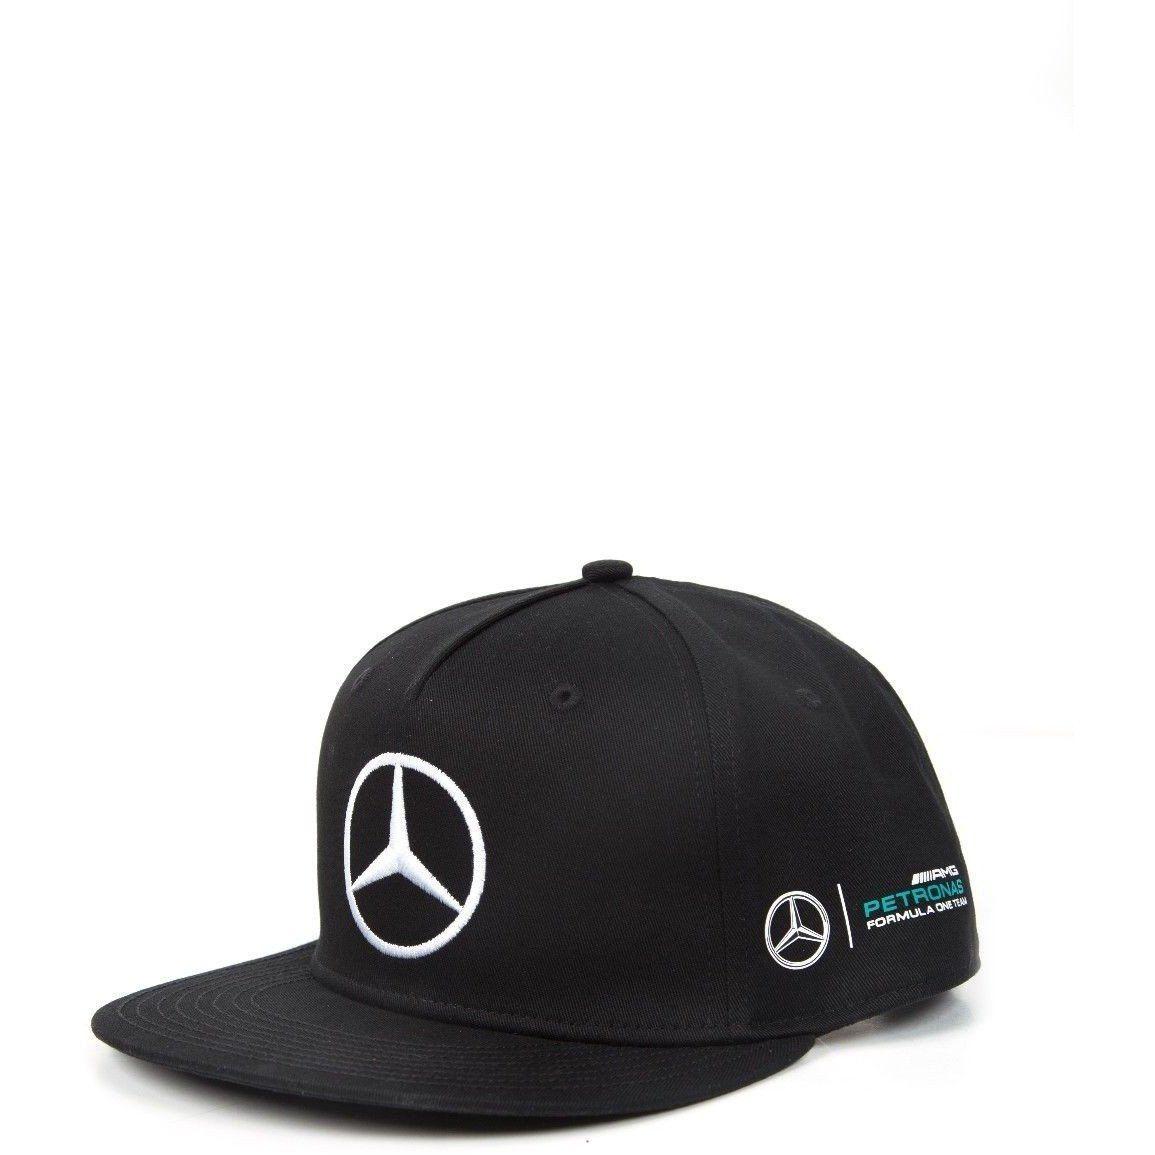 Mercedes Benz Petronas Formula 1 Lewis Hamilton Black Flat